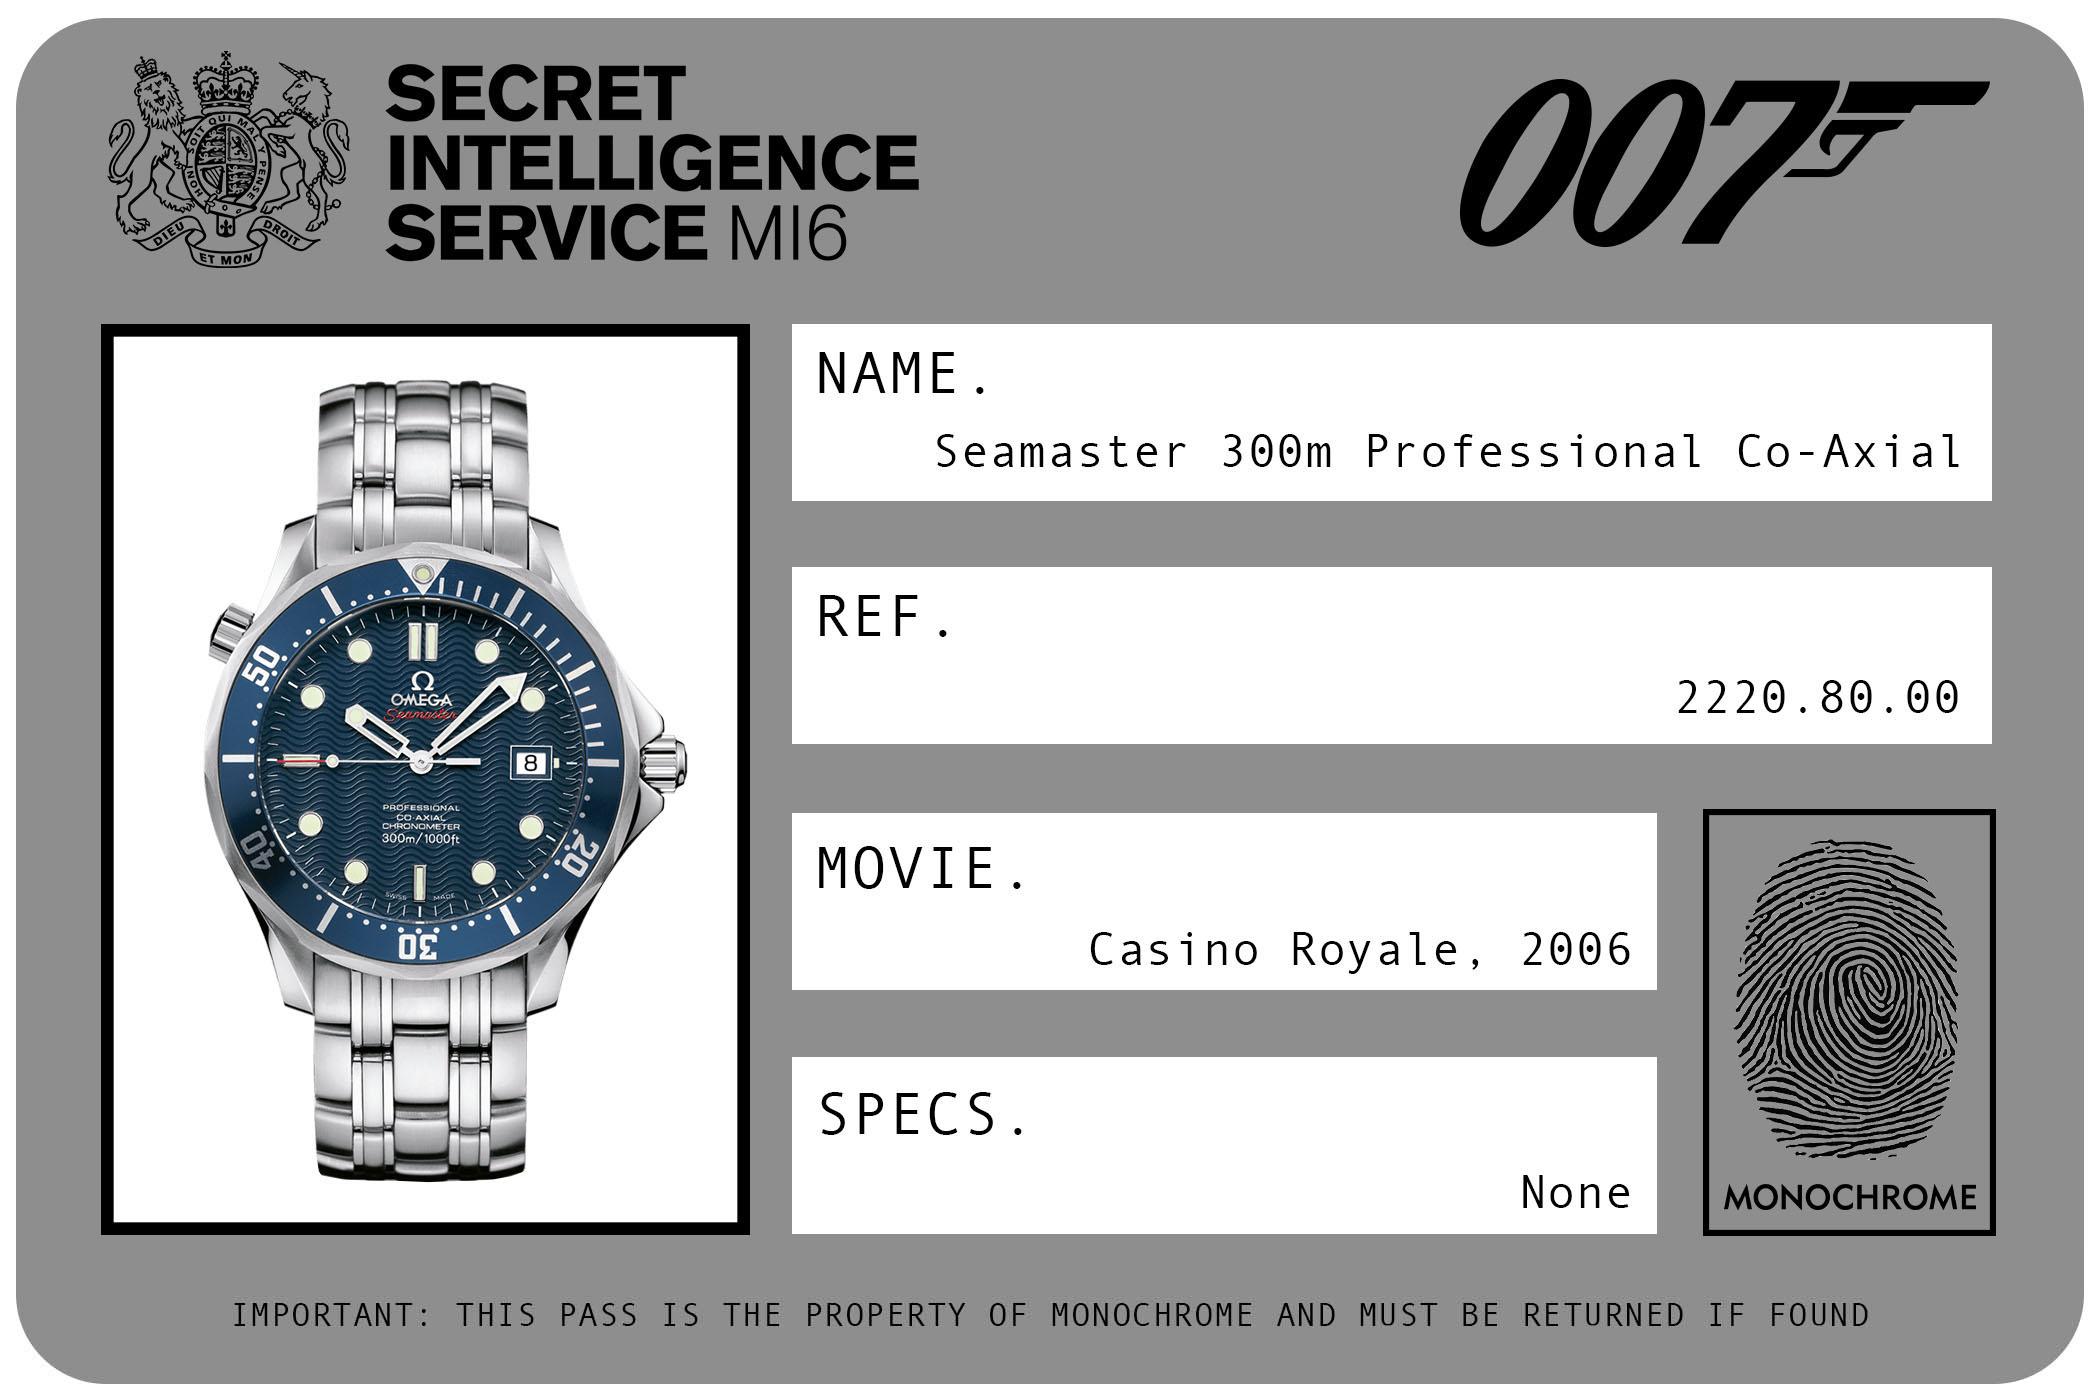 Omega Seamaster 300m Professional Co-Axial 2220.80.00 James Bond Casino Royale ID Card 2006